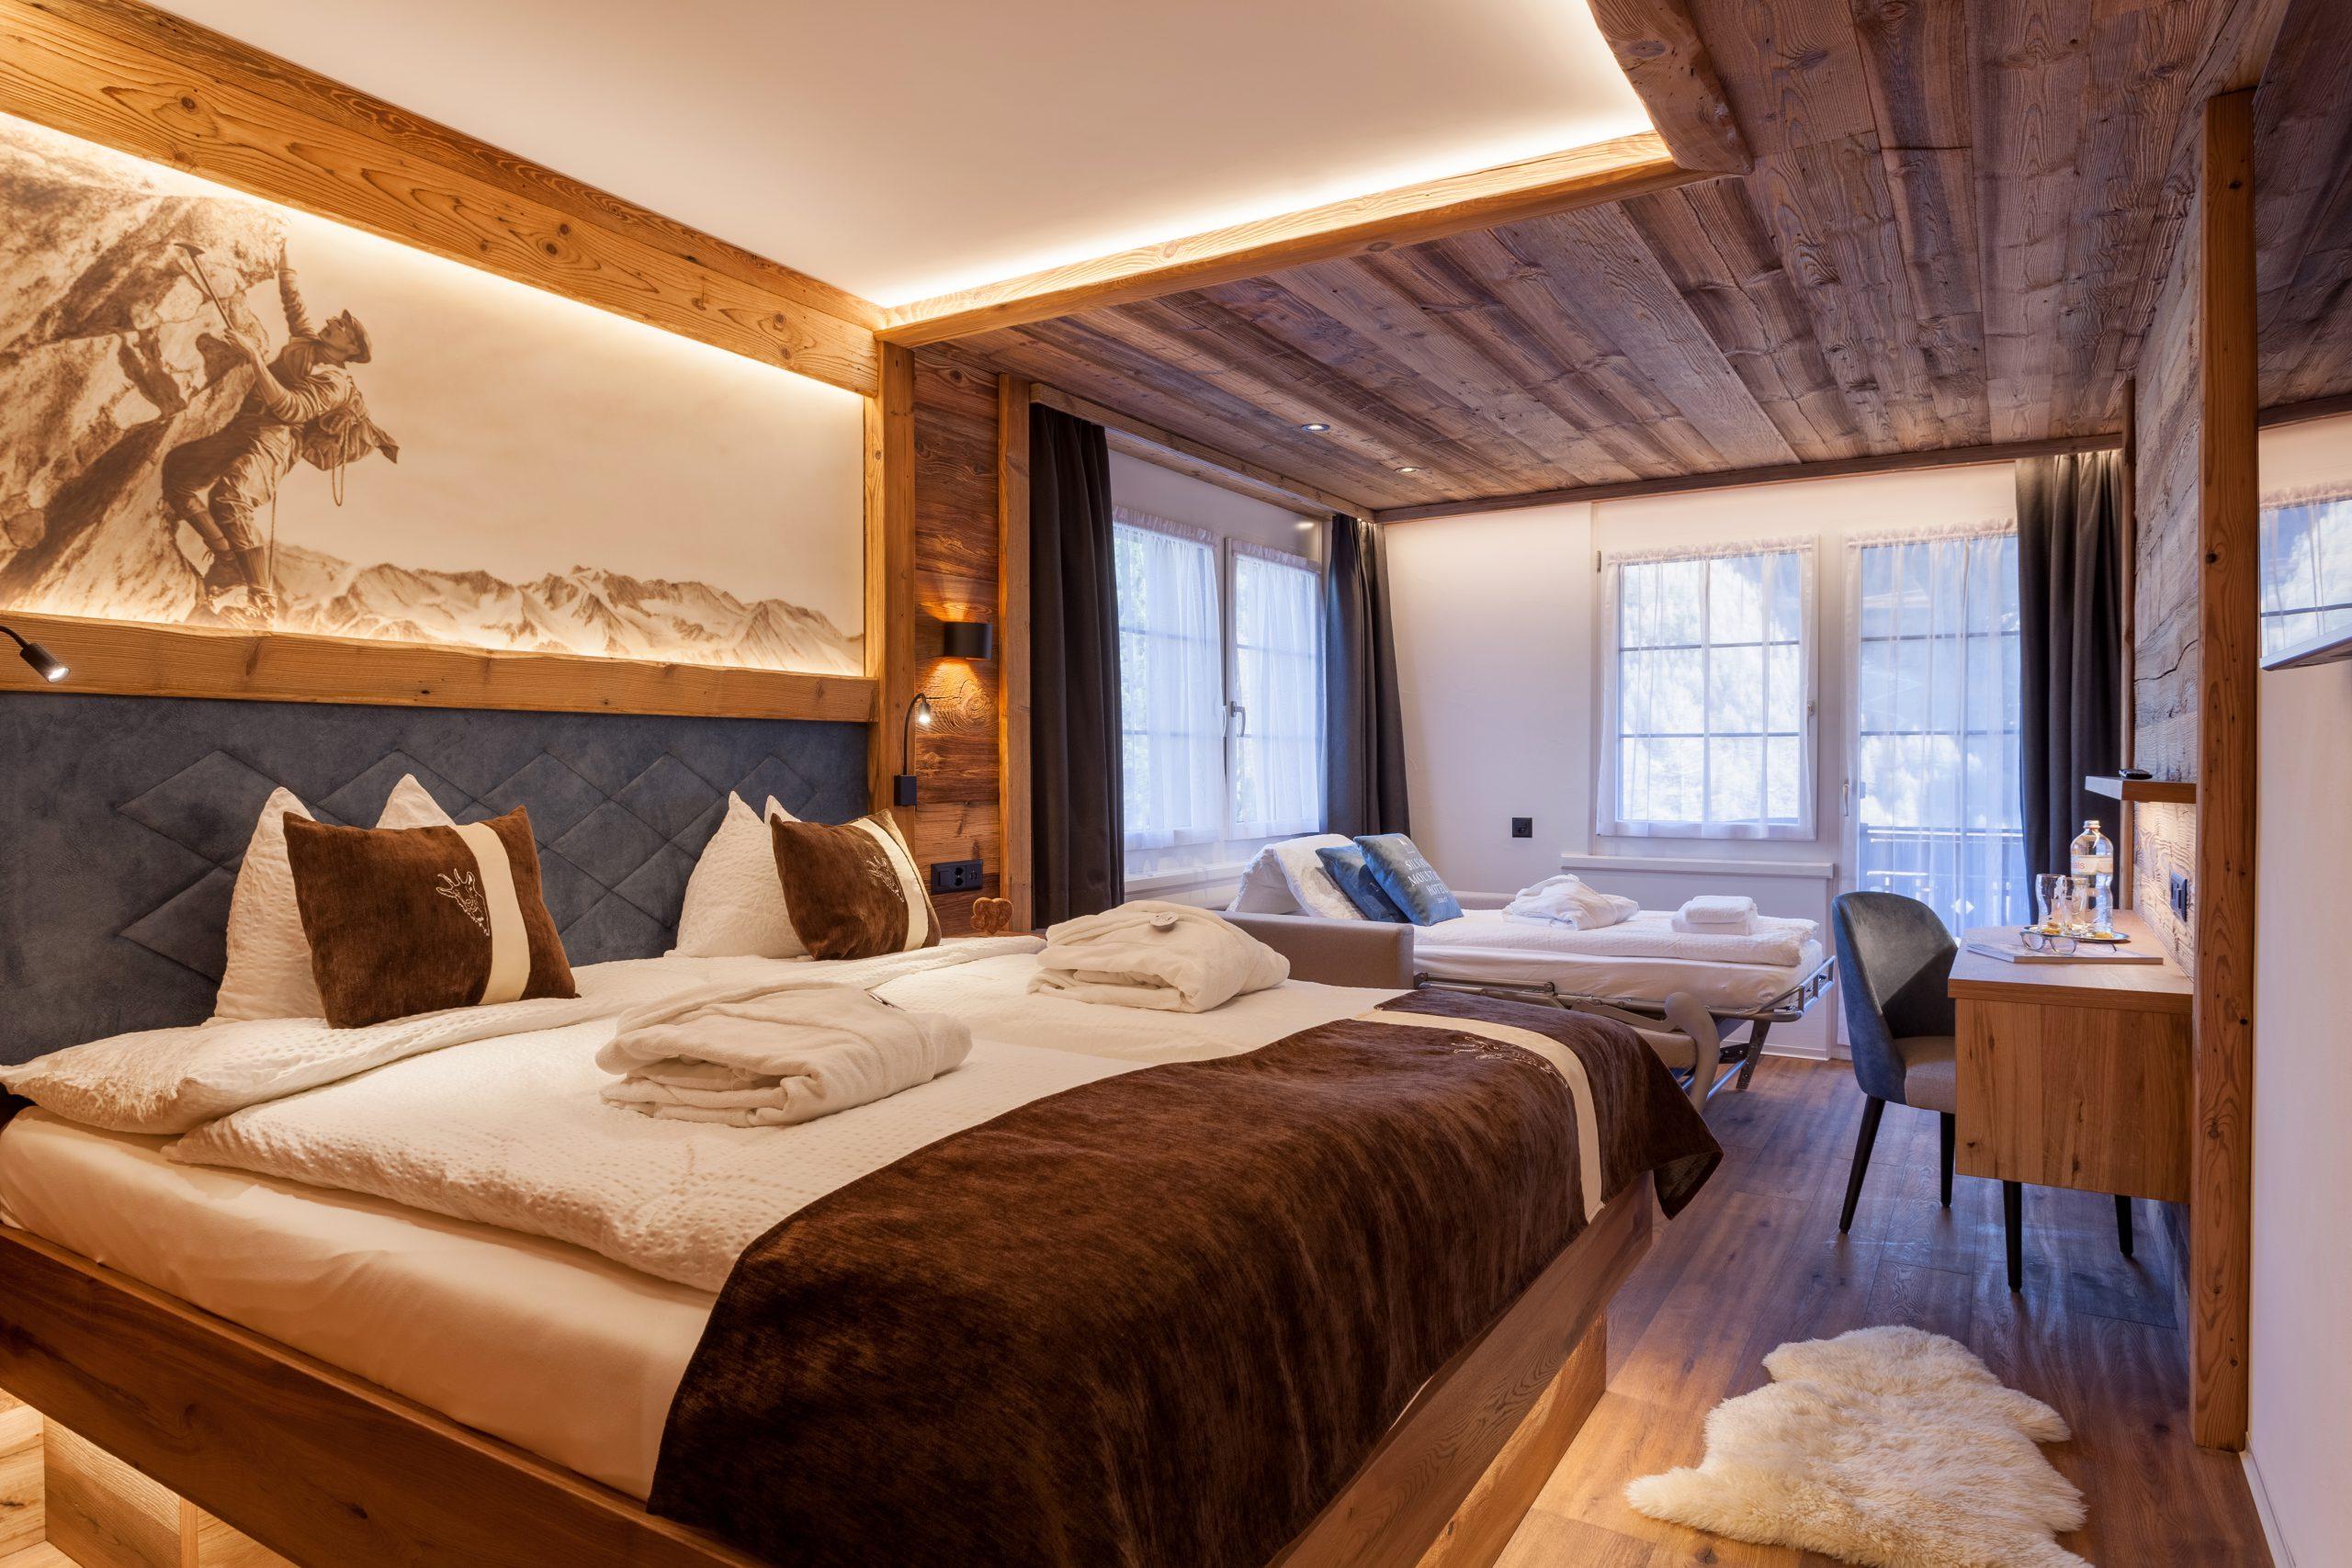 Doppelzimmer Ost mit Zustellbett